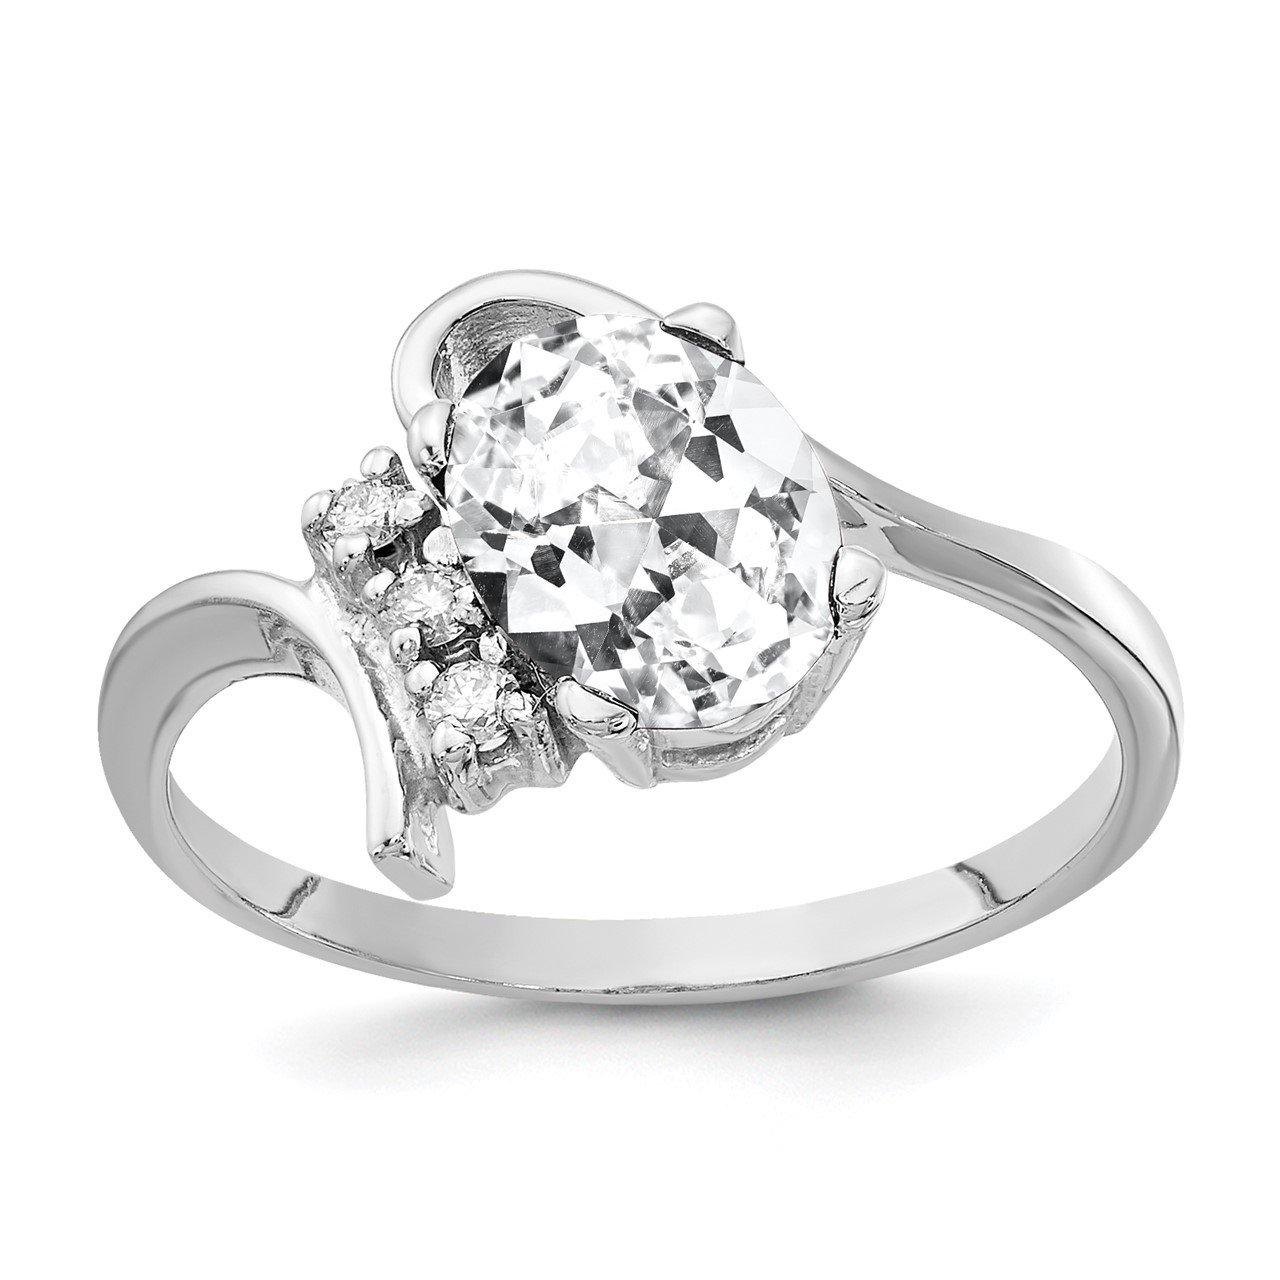 14k White Gold 8x6mm Oval Cubic Zirconia AA Diamond Ring